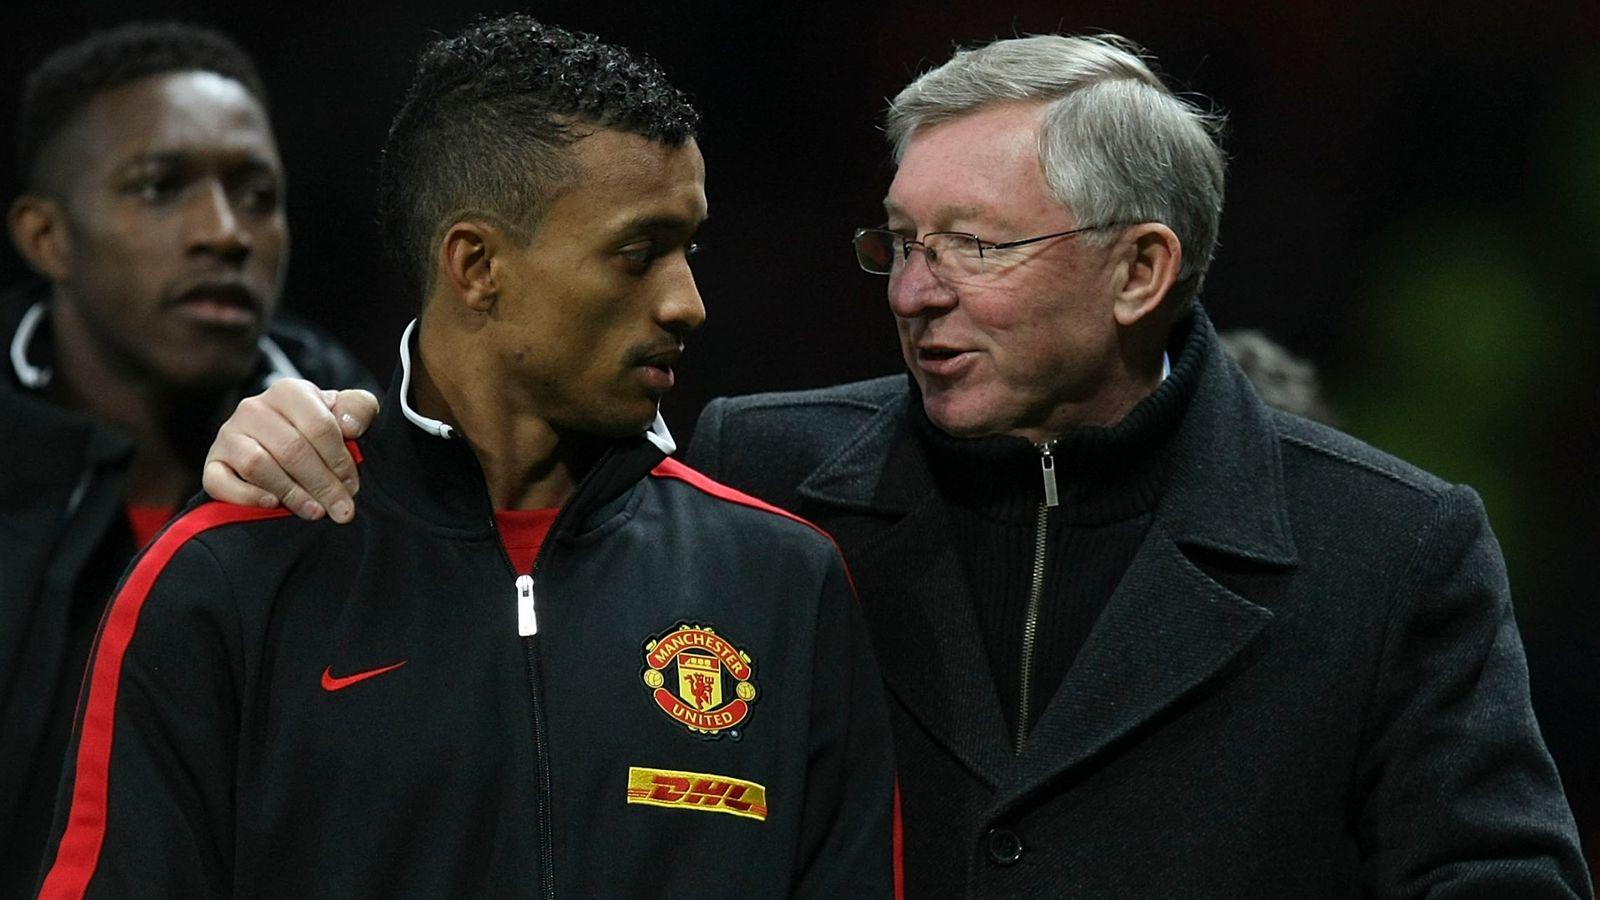 Man Utd: Sir Alex Ferguson 'me asustó' al principio, dice Nani   Noticias de futbol 17